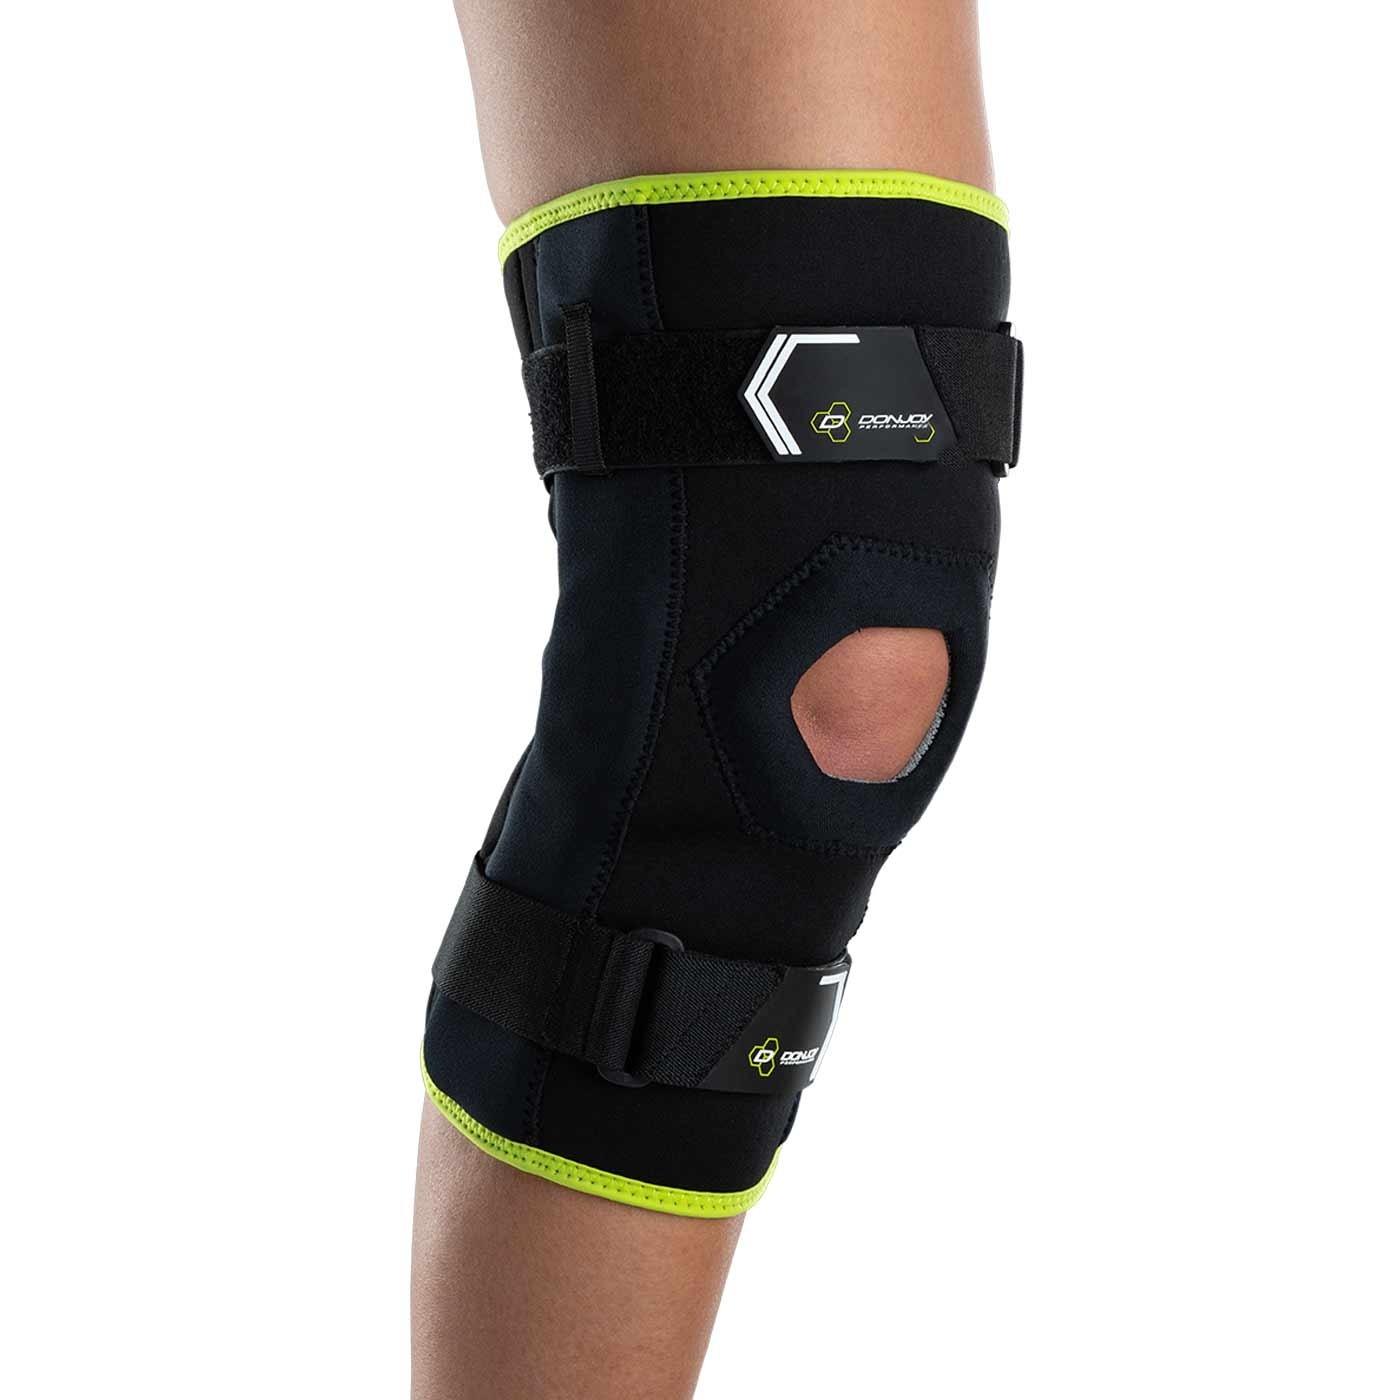 DonJoy Performance Bionic Comfort Hinged Knee Brace